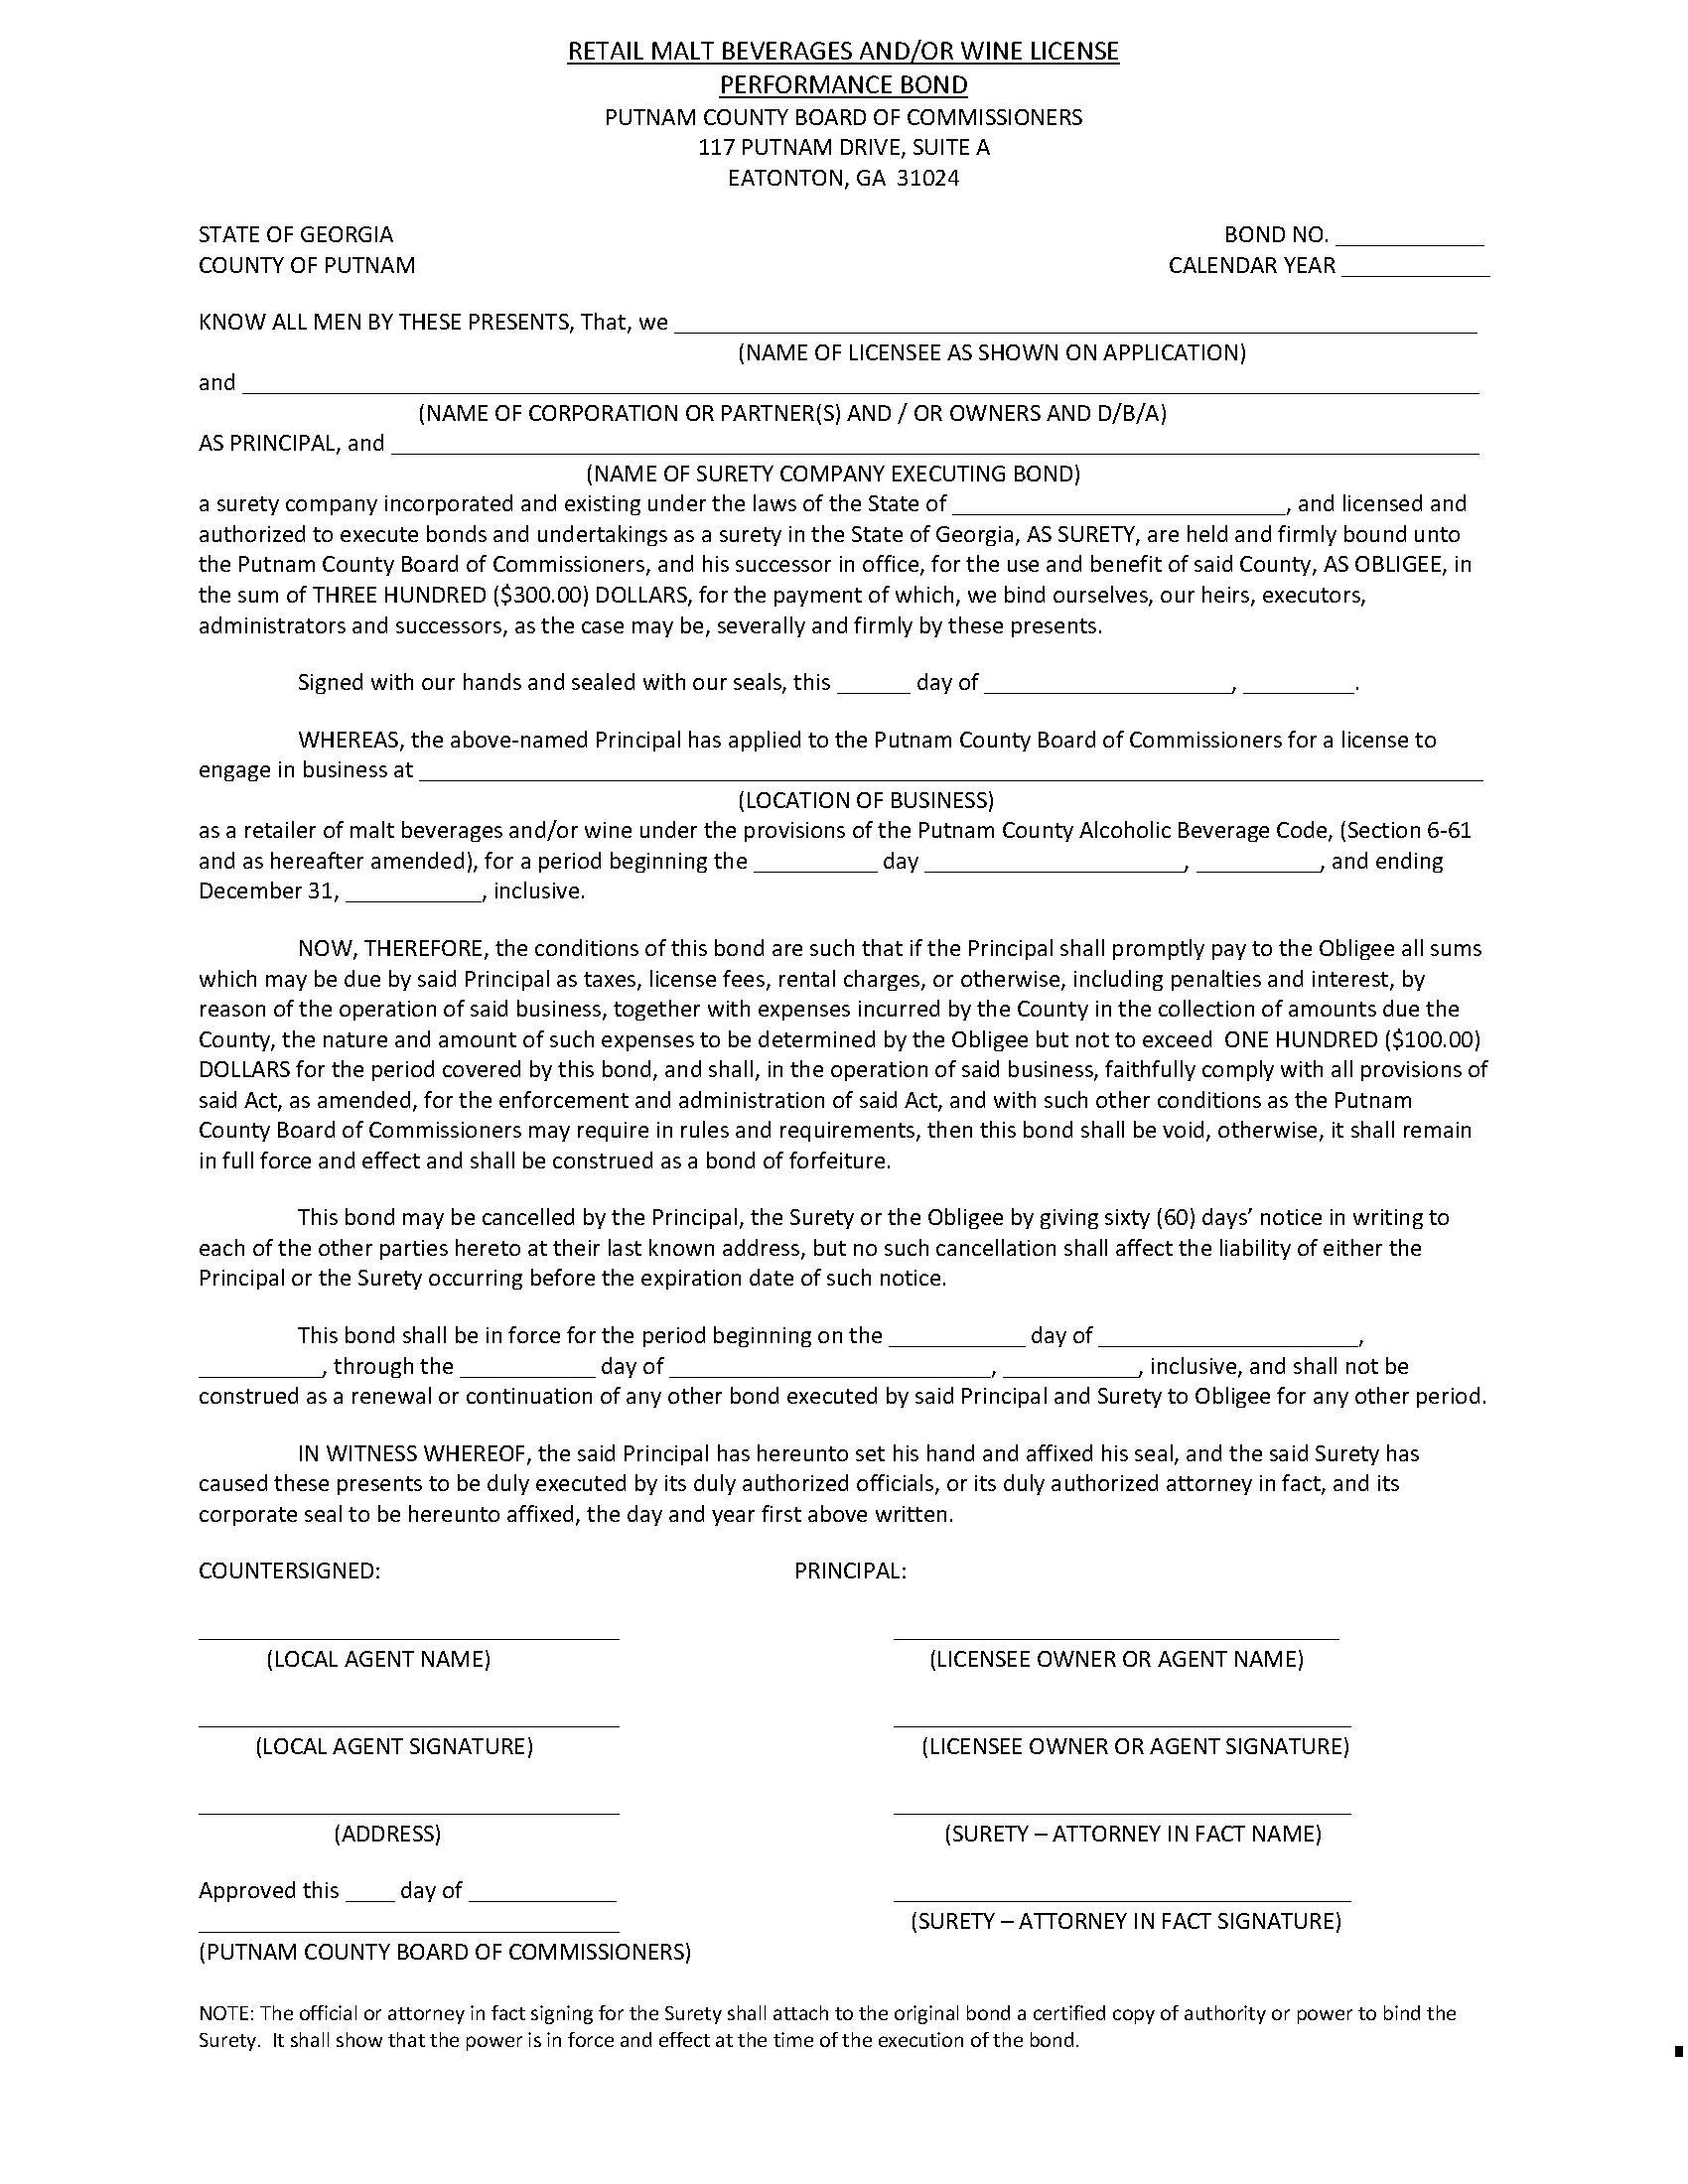 Putnam County Retail Malt Beverage and/or Wine License sample image